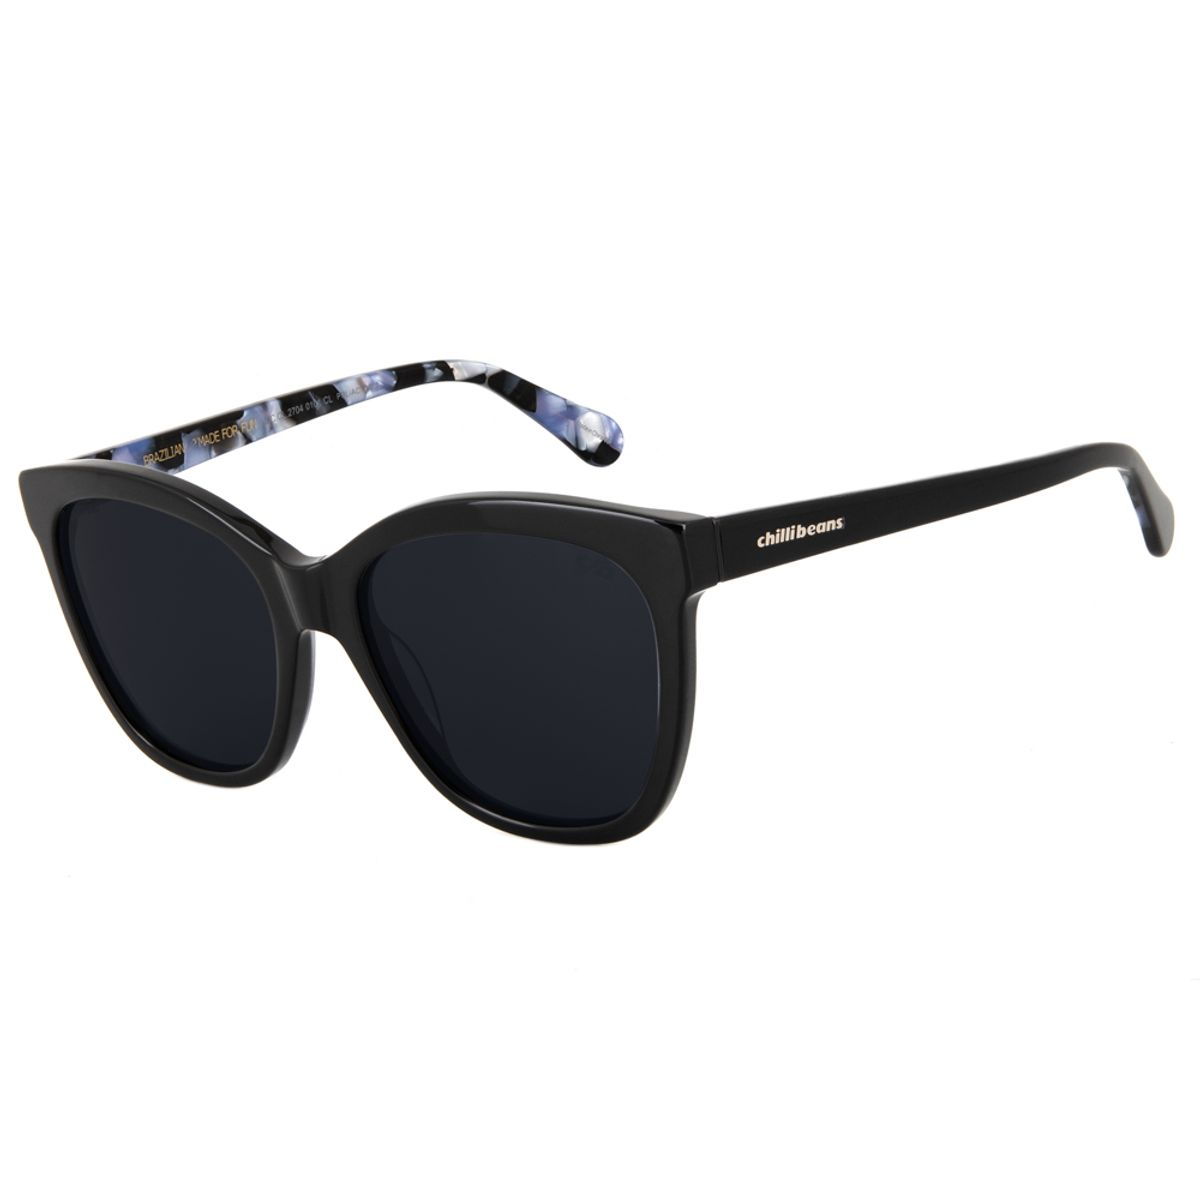 ba3b7069e Óculos de Sol Chilli Beans Clássico Lady Like Preto Polarizado 2704 ...